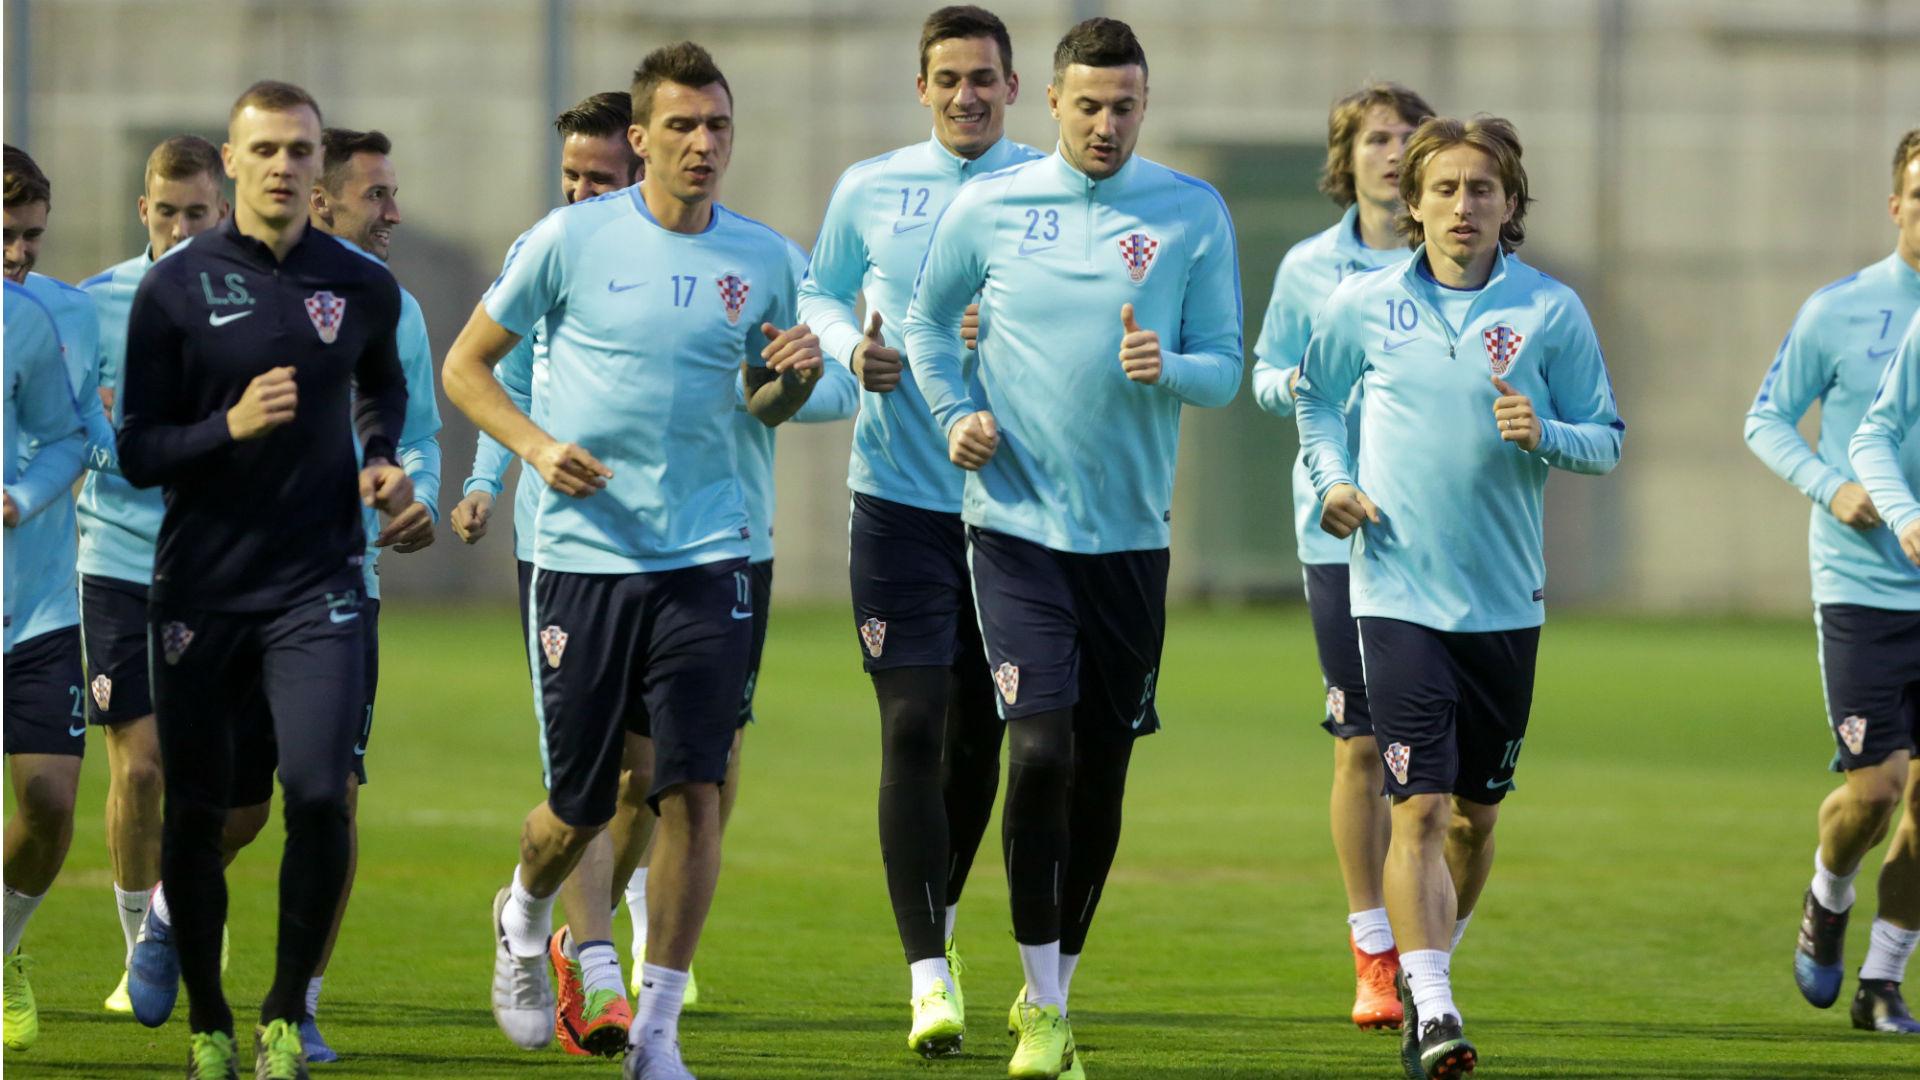 Mario Mandzukic, Danijel Subasic, Luka Modric Croatia